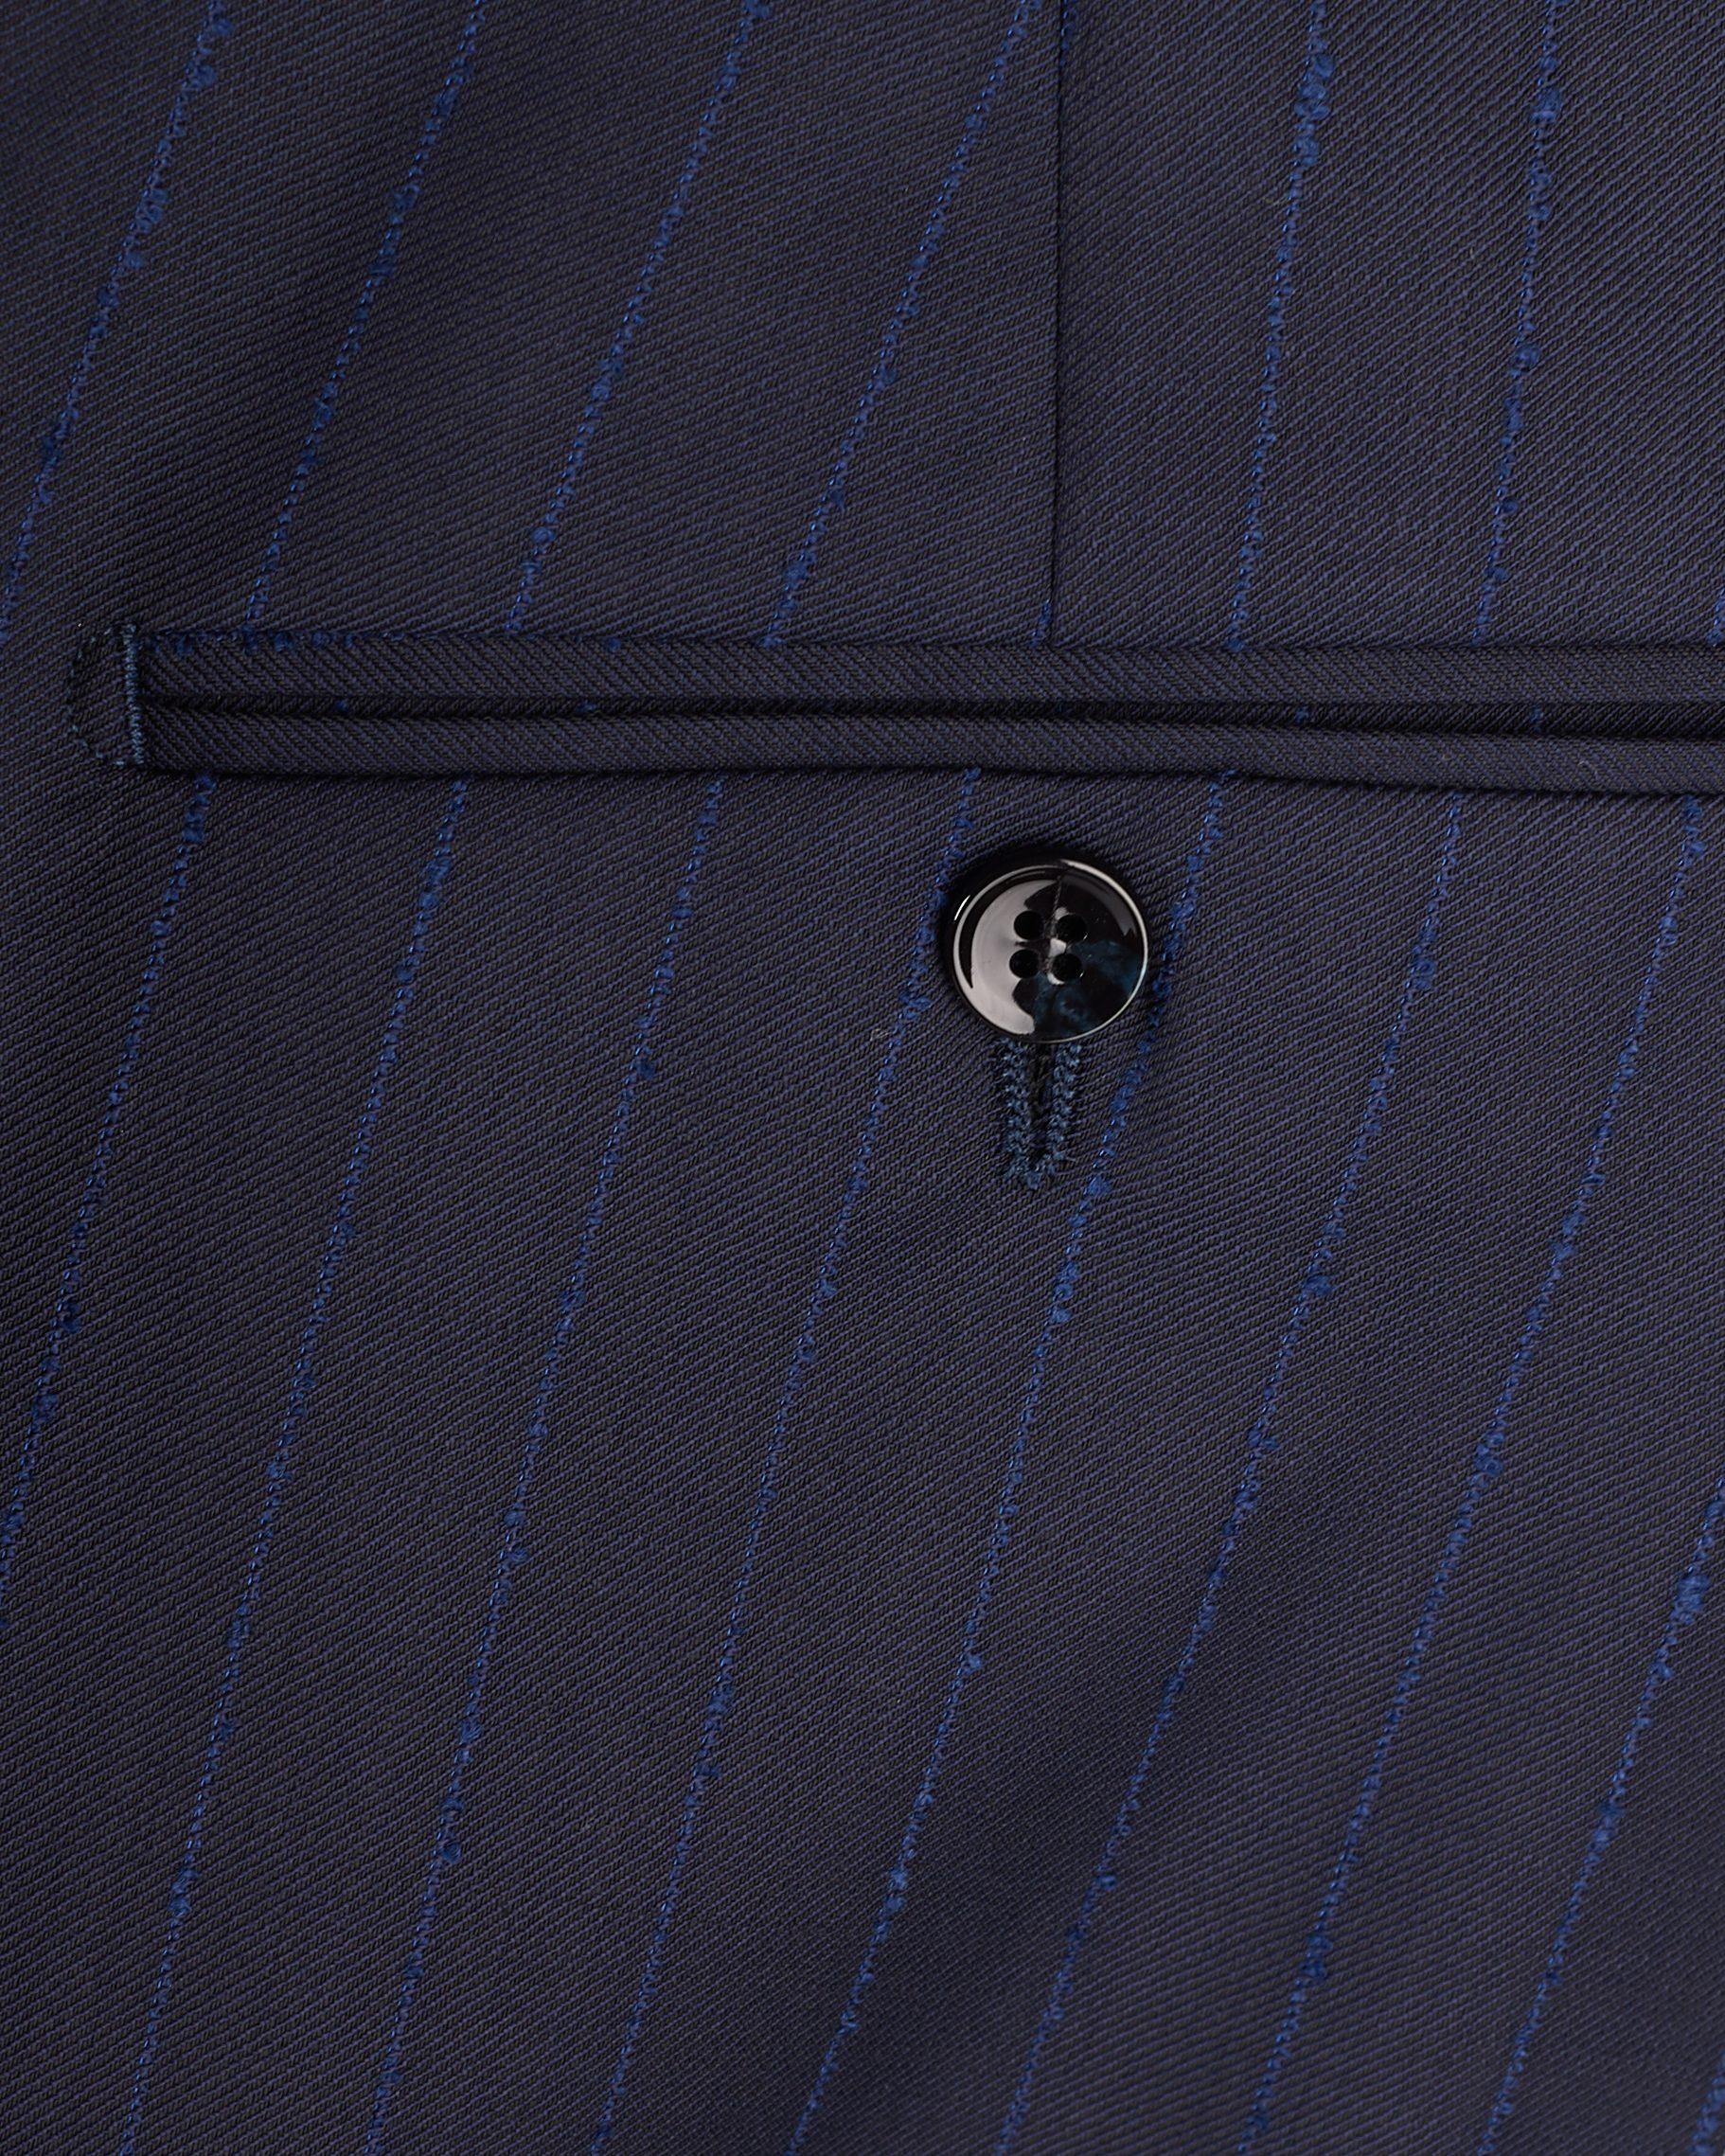 Costum-Bleumarin-Barbati-Cu-Vesta-Albastra-Magazin-Costume-Barbati-Cluj-Napoca-Gentlemens-Boutique-Gold-Soporului-8-Detalii-Pantaloni-